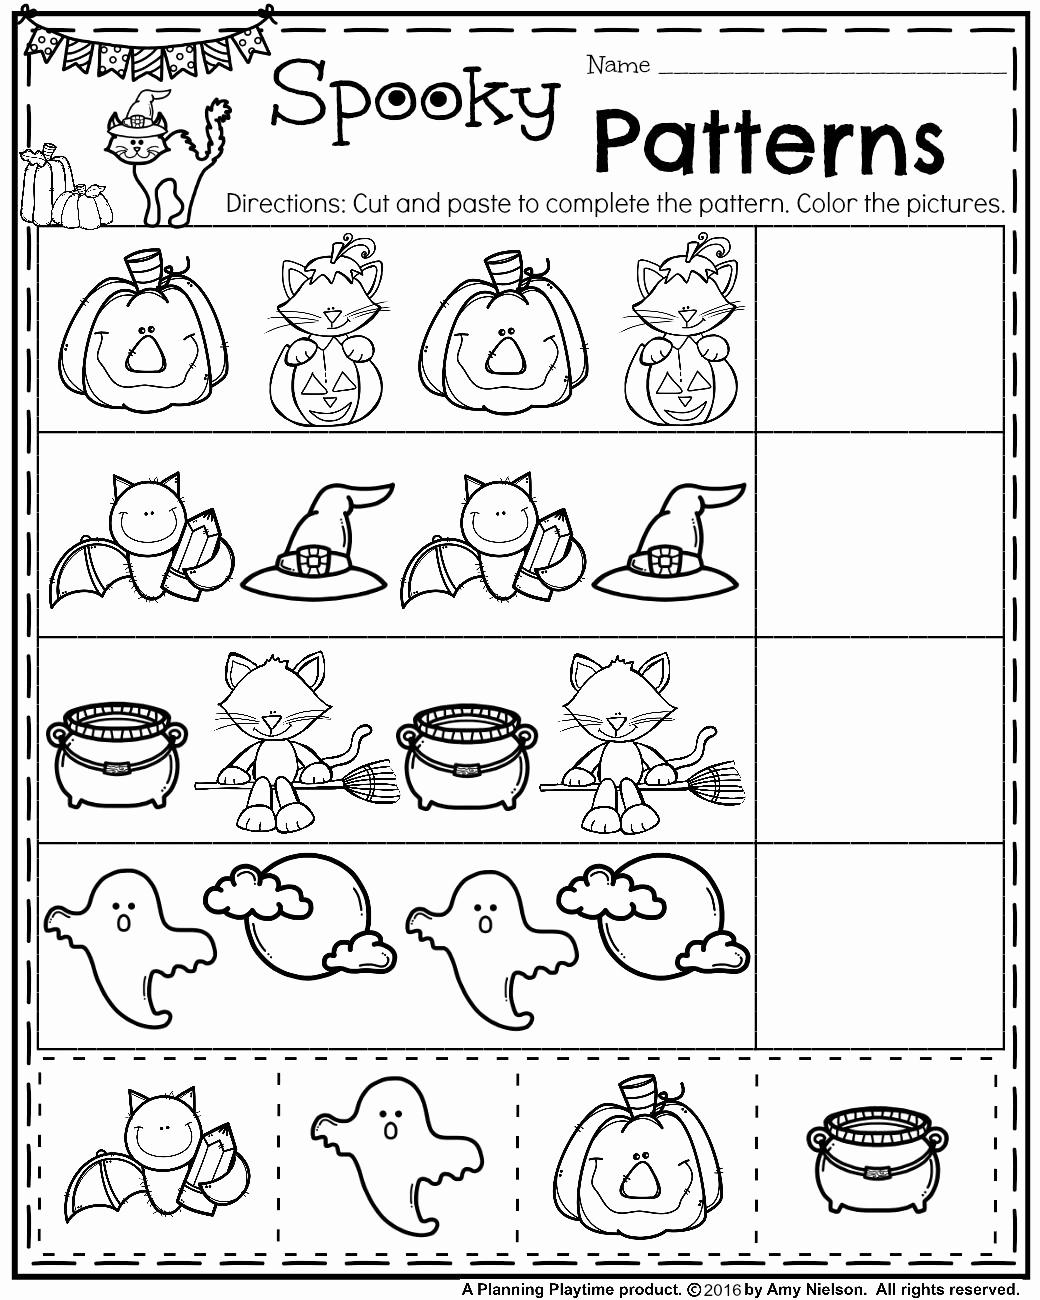 Free Kindergarten Halloween Worksheets Printable Fresh Free Halloween Worksheet for Kindergarten – Servicenumber